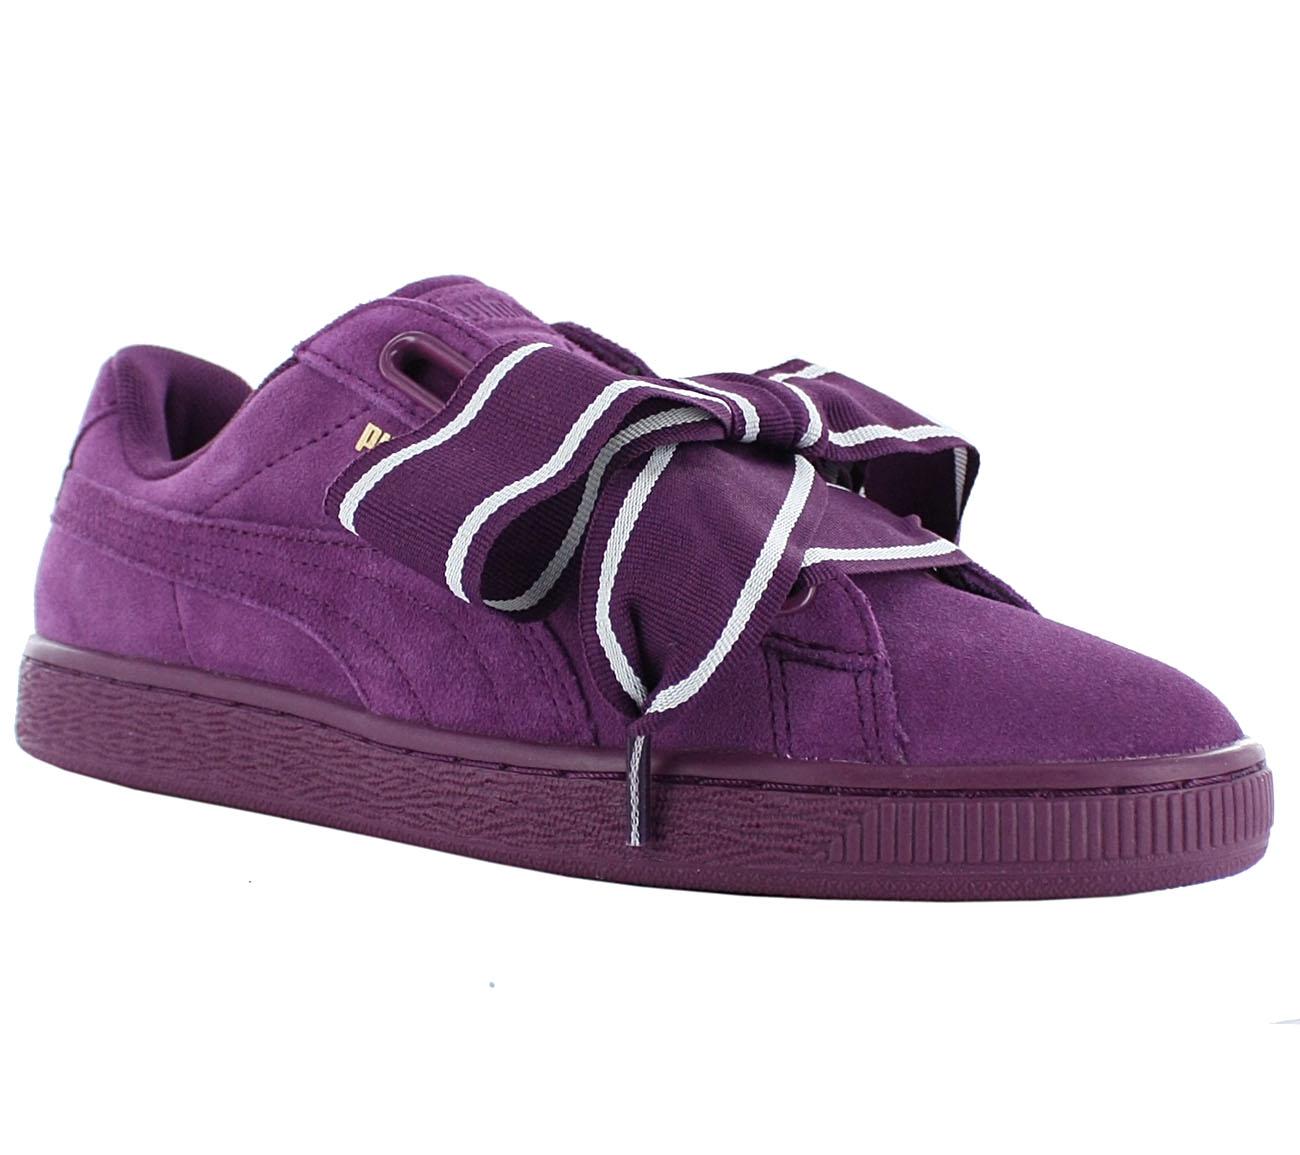 Details zu Puma Suede Heart Satin 2 Women's Sneaker Shoes Purple Basket Vikky New 364084 02